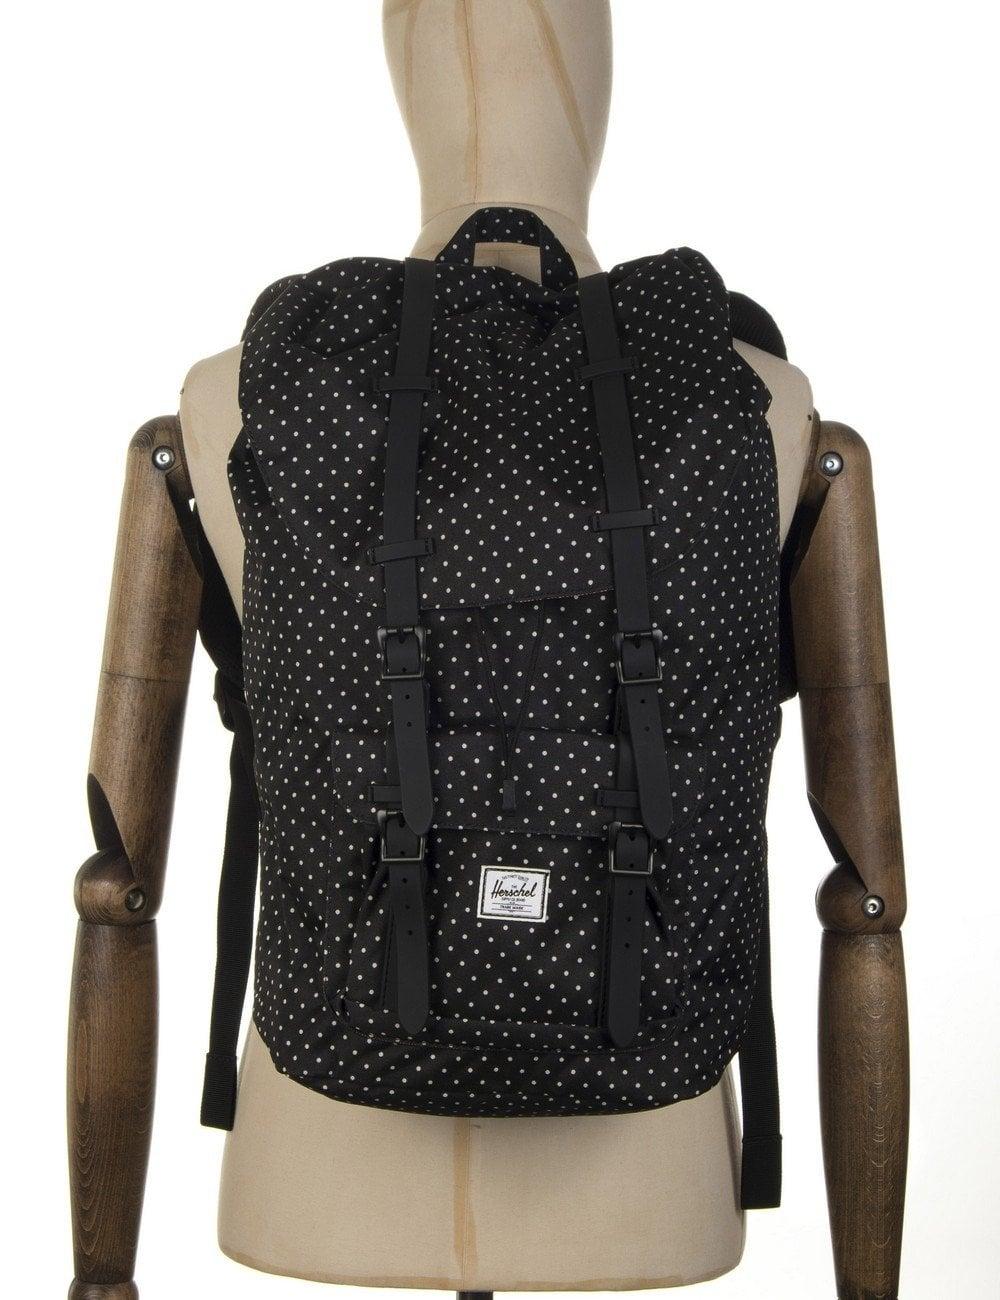 17a8b8c4d56b Herschel Supply Co Little America Backpack - Black Polka Dot ...